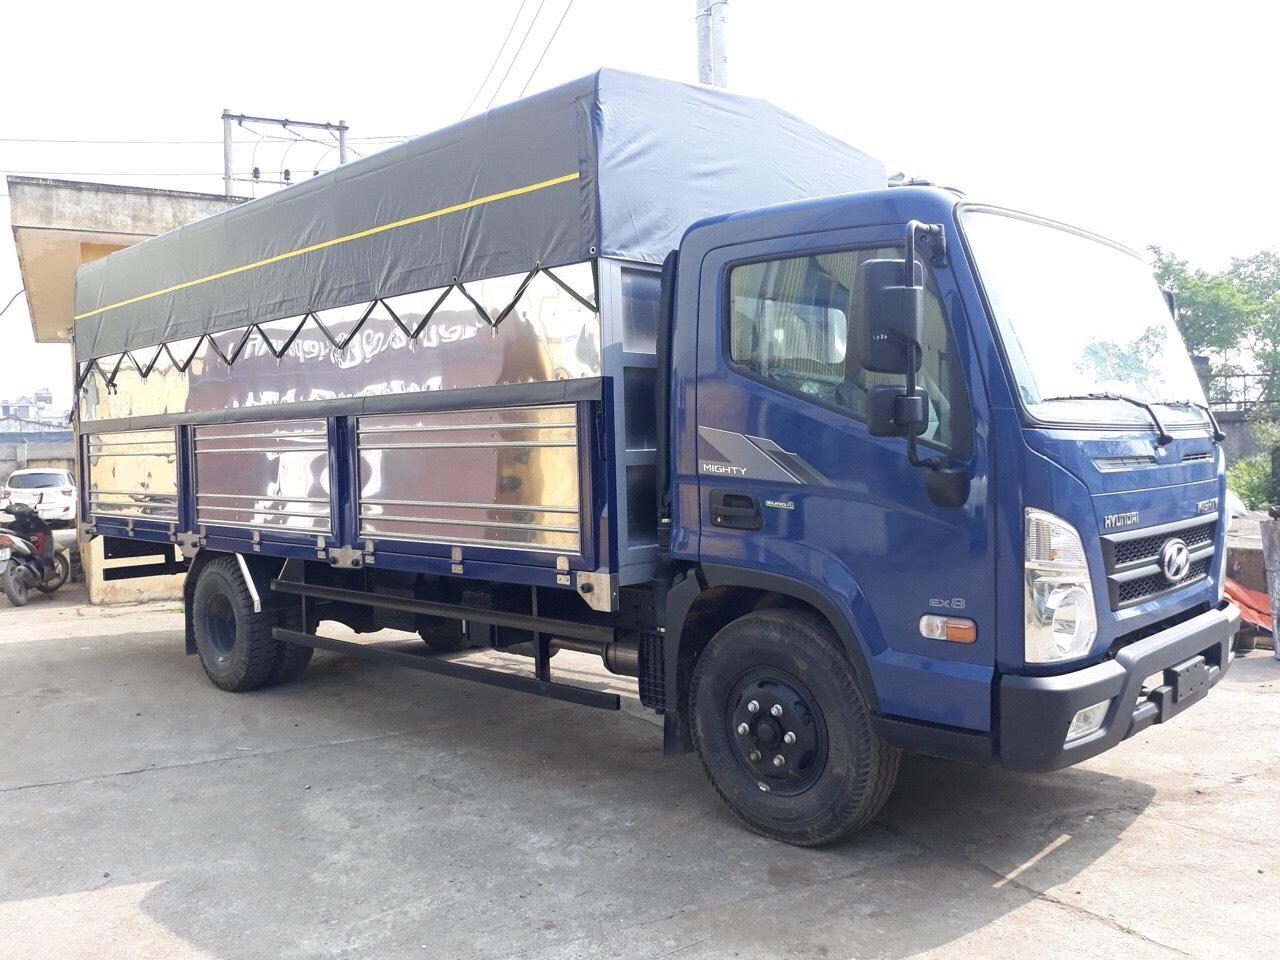 Bán xe tải Hyundai EX8 tại Lai Châu